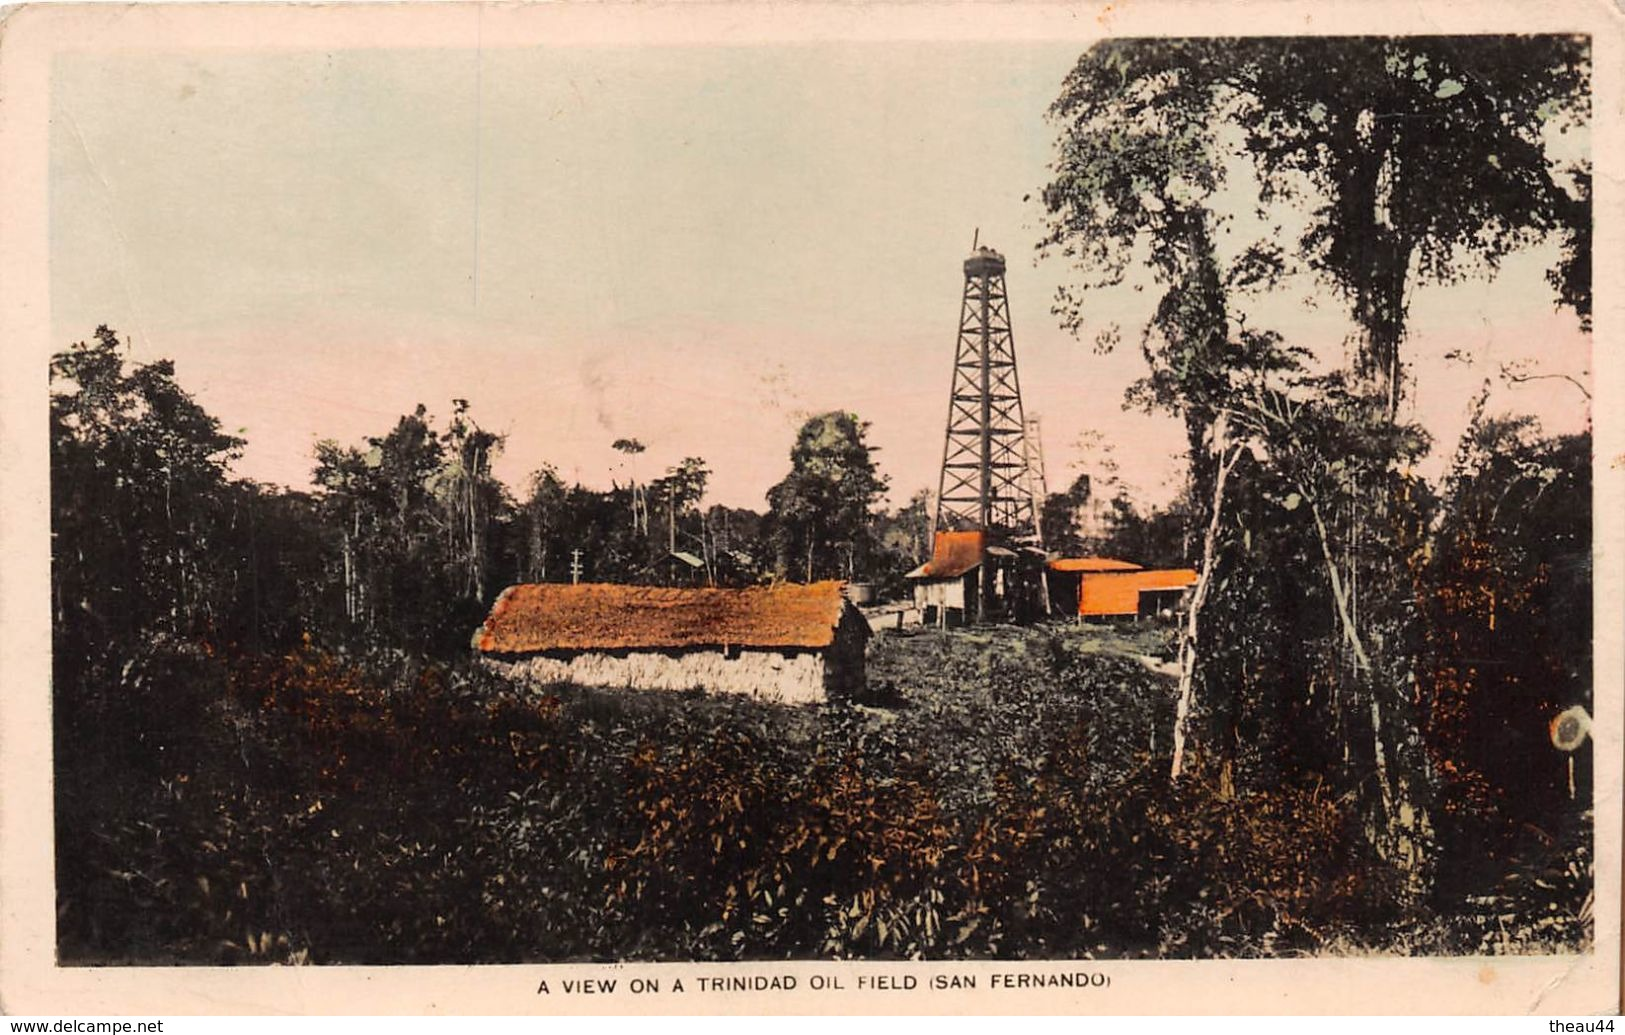 ¤¤  -  A View On A TRINIDAD Oil Field  -  SAN-FERNANDO  -  ¤¤ - Trinidad